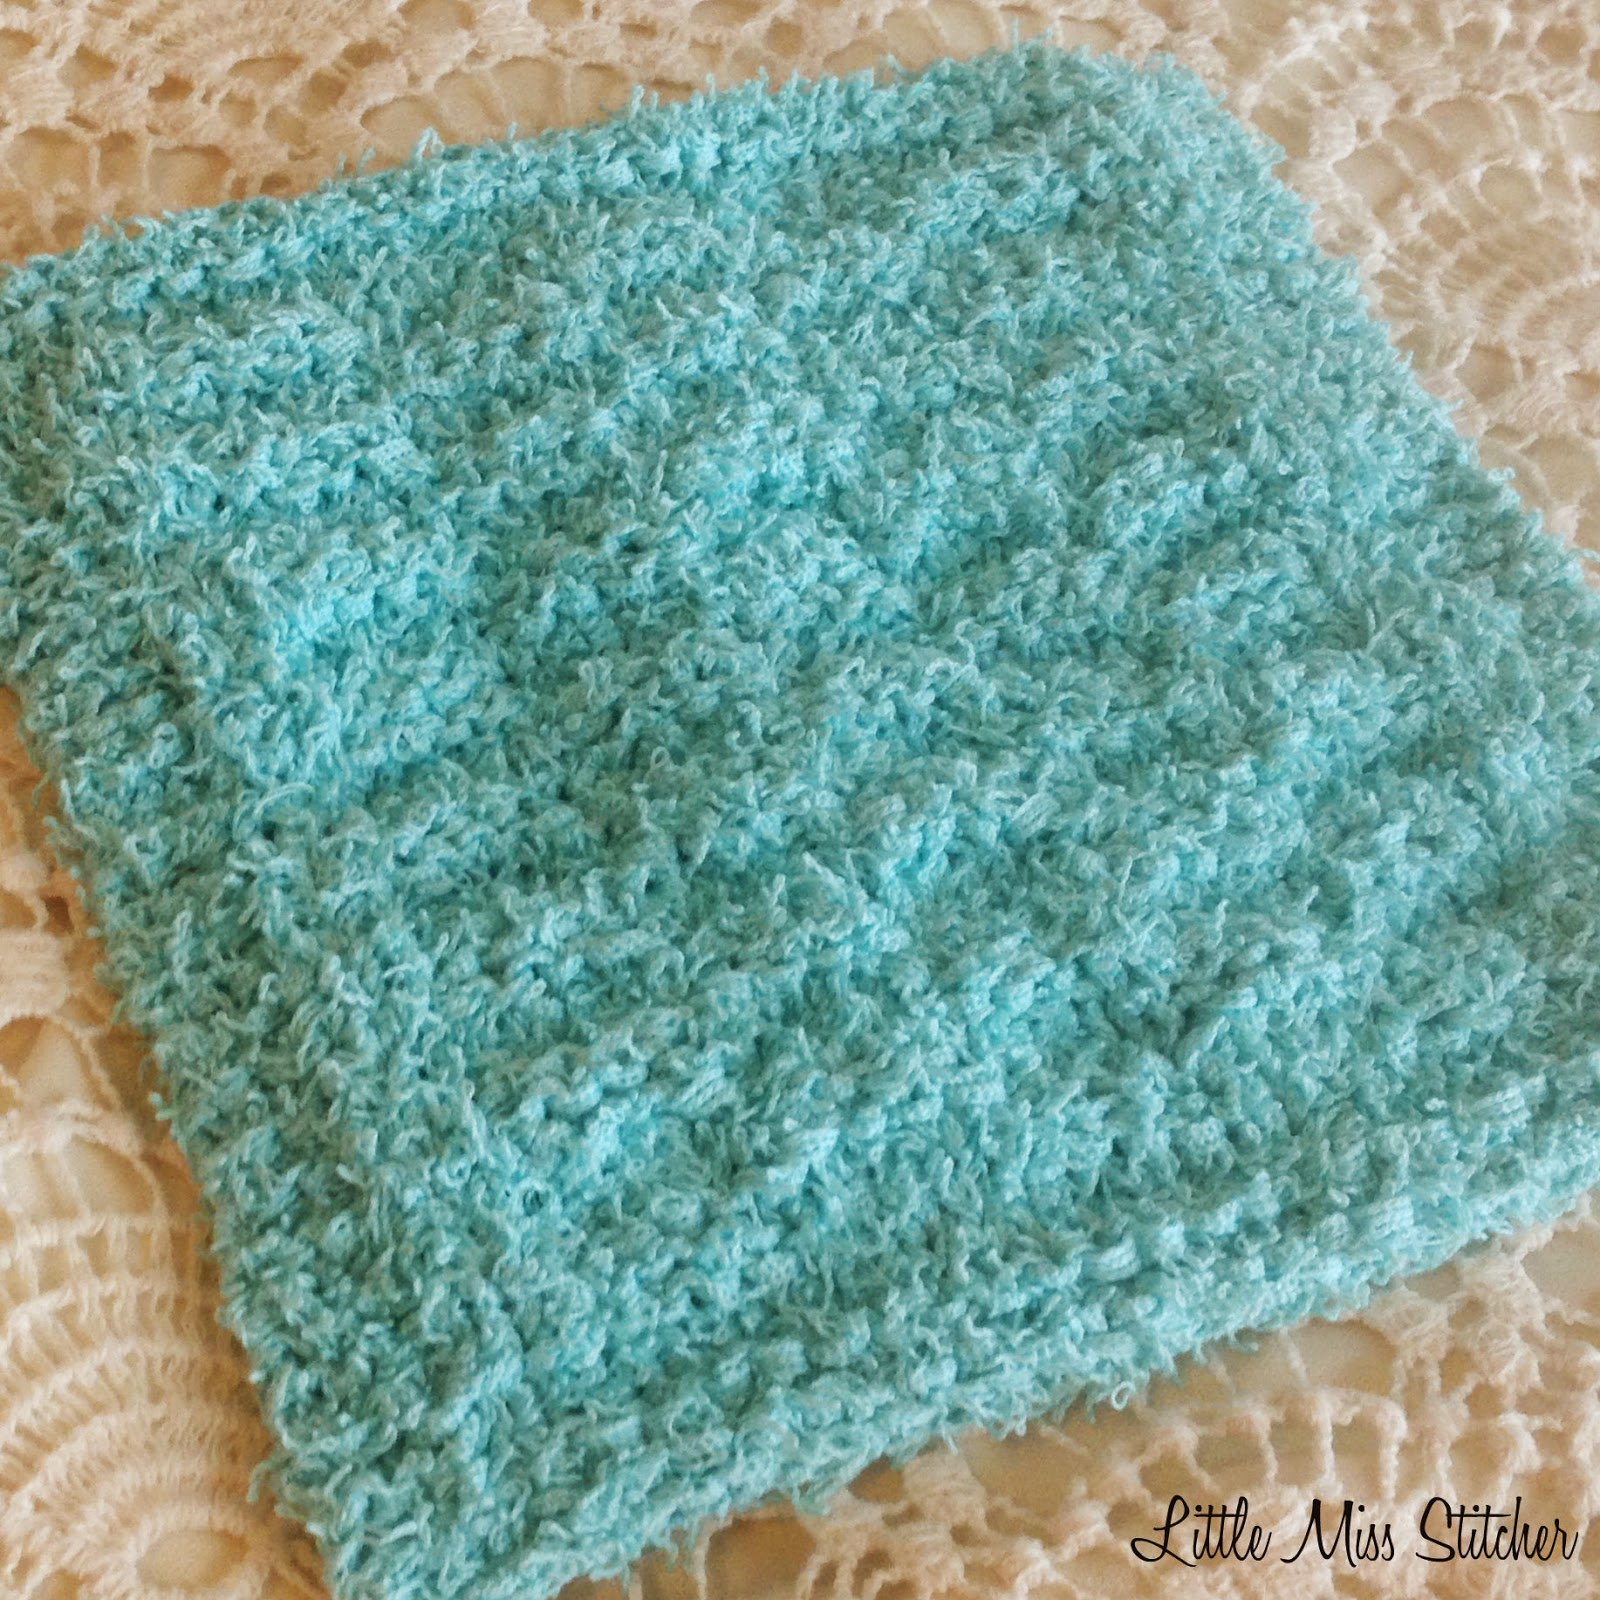 Knit Waffle Stitch Dishcloth : Little Miss Stitcher: 5 Free Knit Dishcloth Patterns